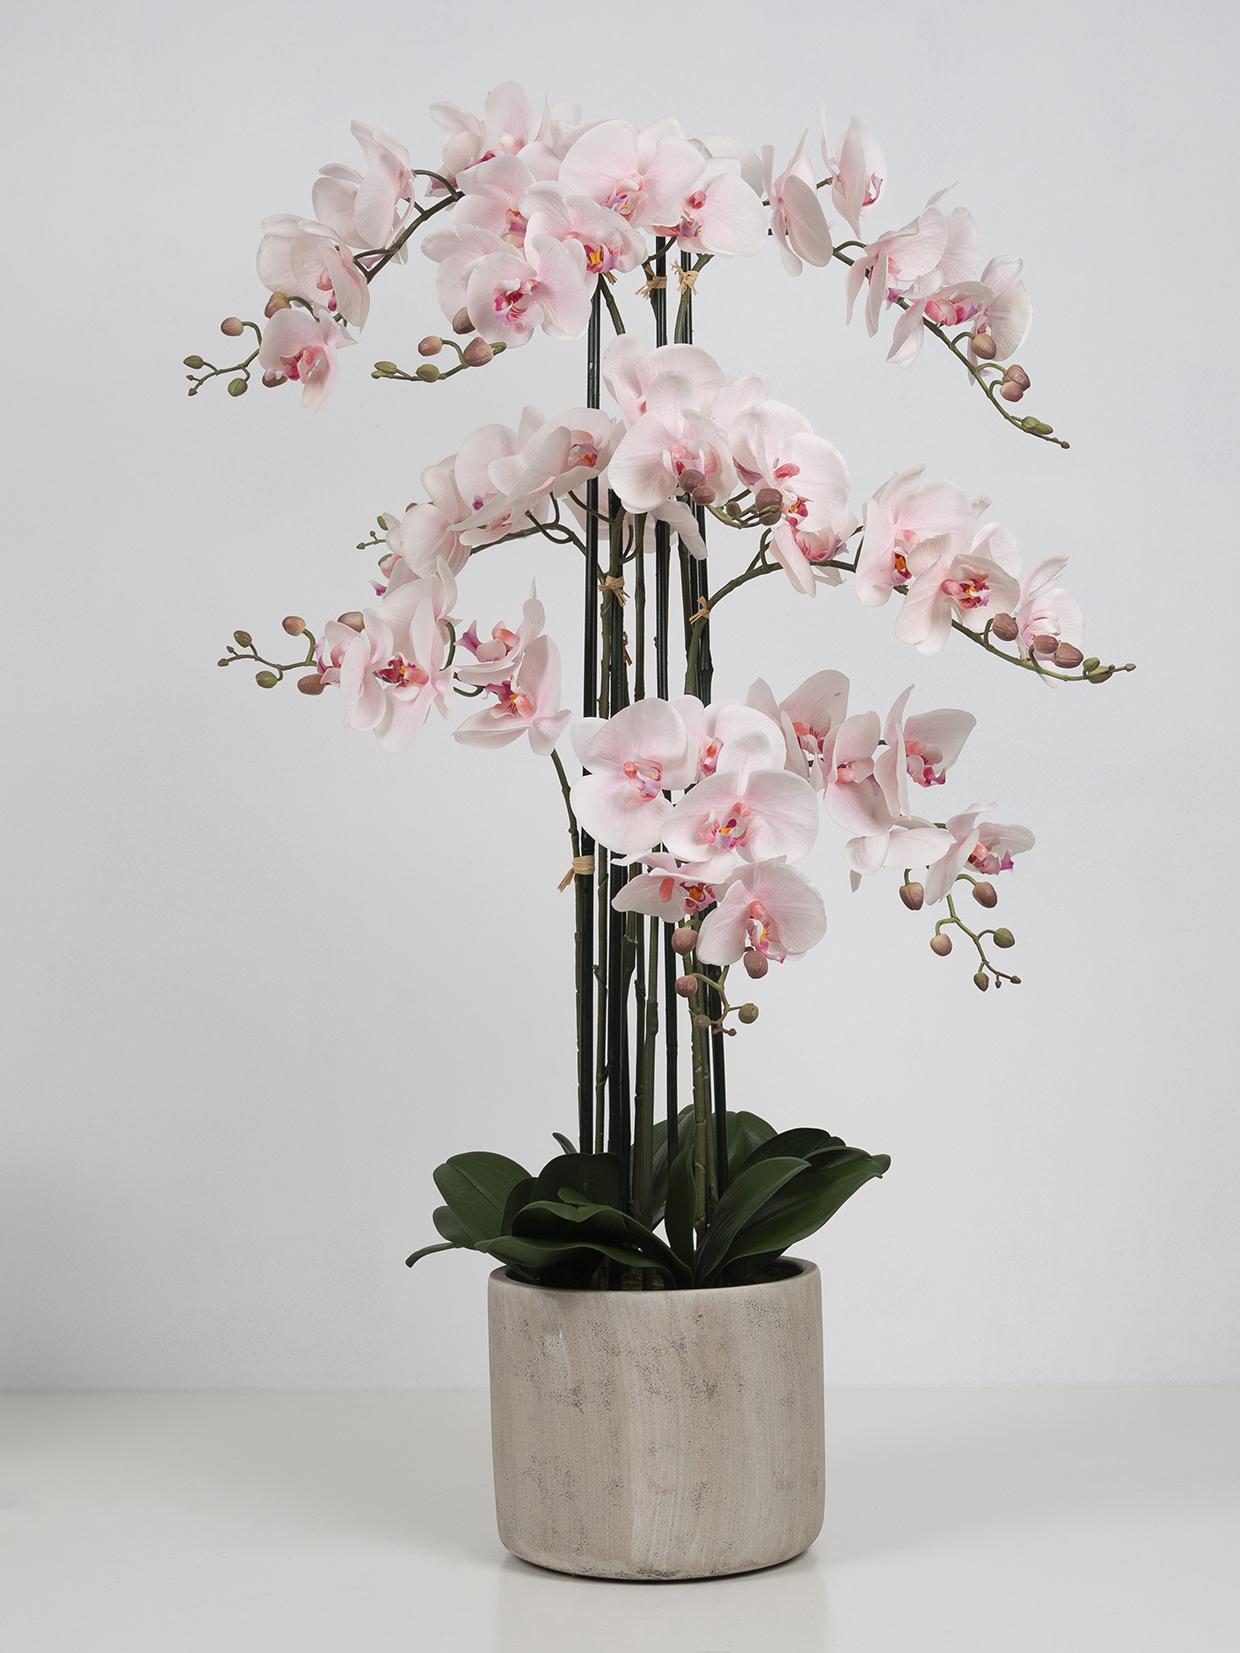 Orkide 9-grenet, lyserød,  i grå keramikpotte H105 cm